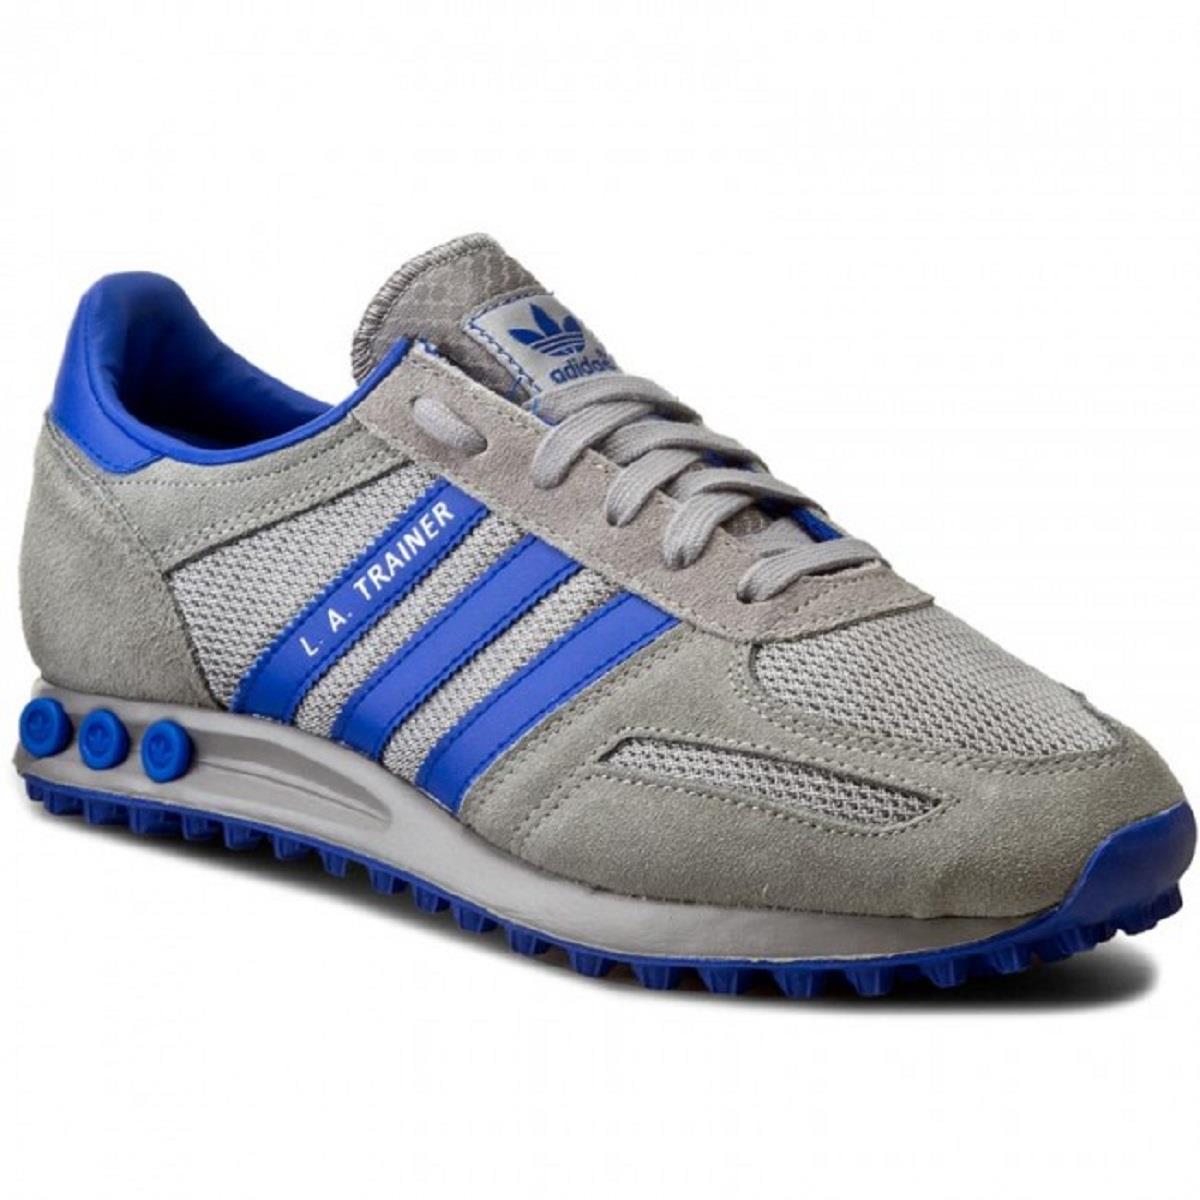 adidas scarpe la trainer uomo